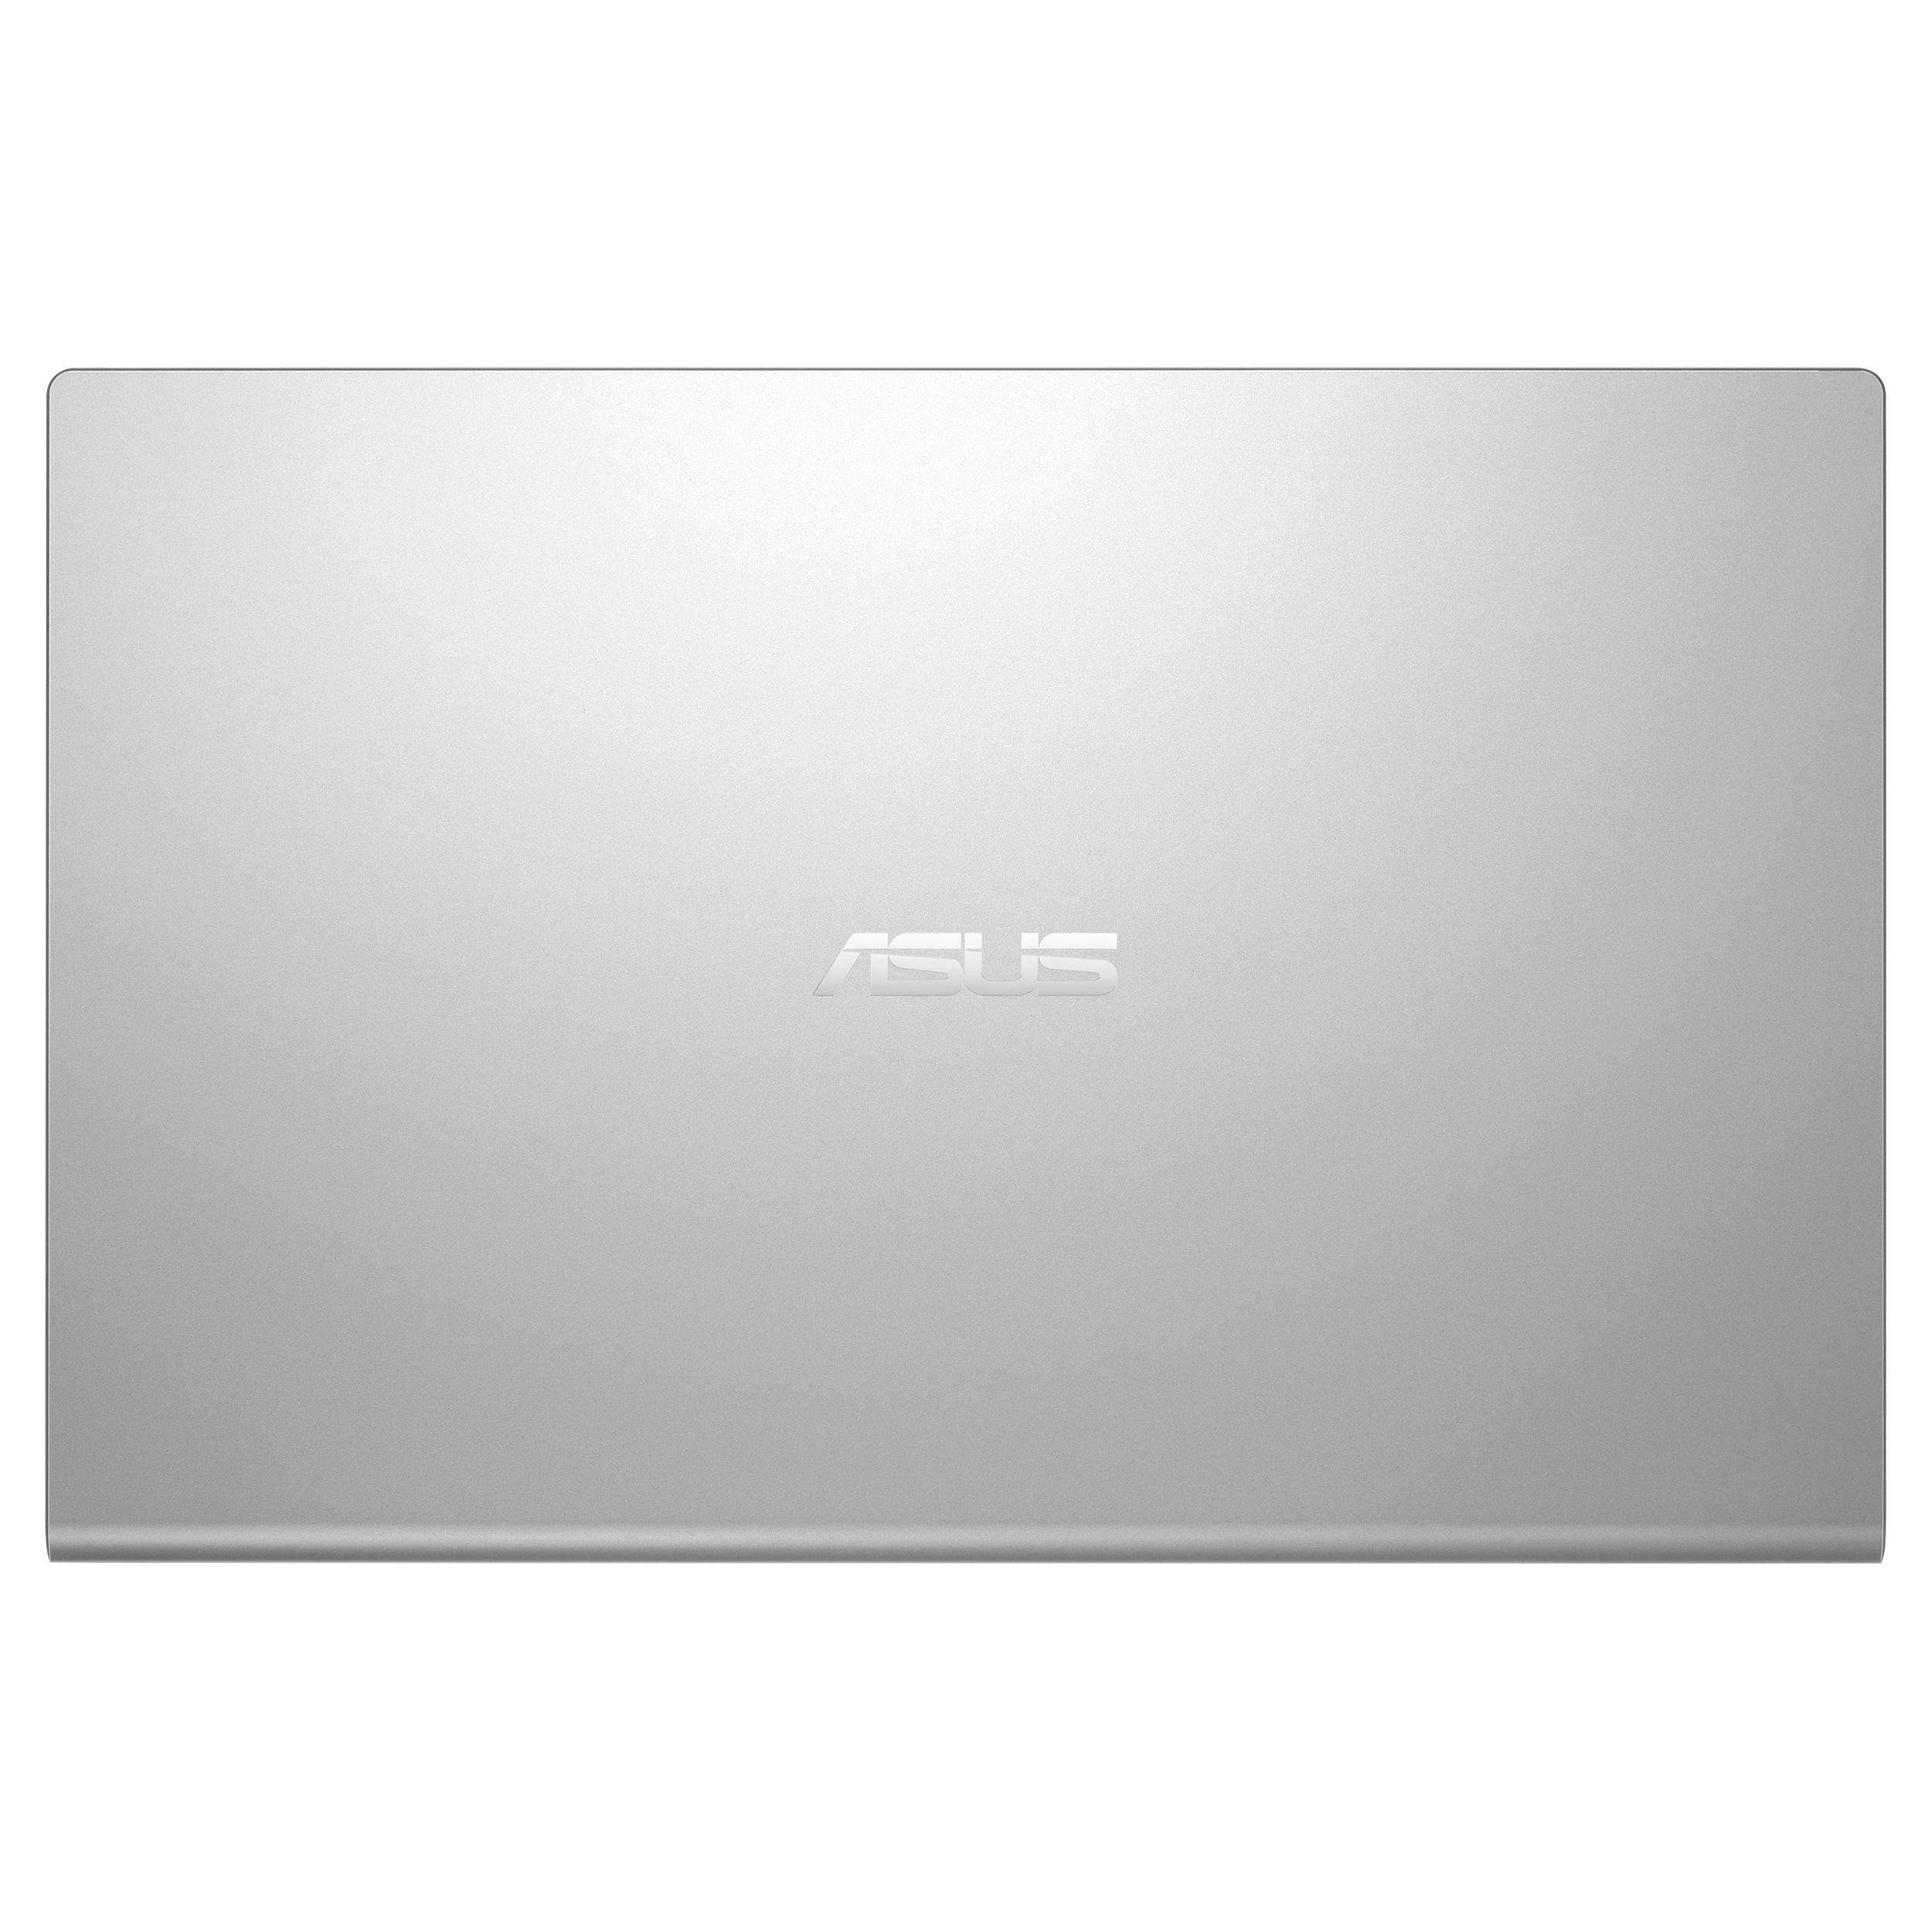 Asus X515EA-BQ562TS (90NB0TY2-M20260) Corei5 11th Gen Windows 10 Home Laptop (8GB RAM, 512GB SSD +32GB Intel Optane Memory, Intel Iris Xe Graphics,... 5